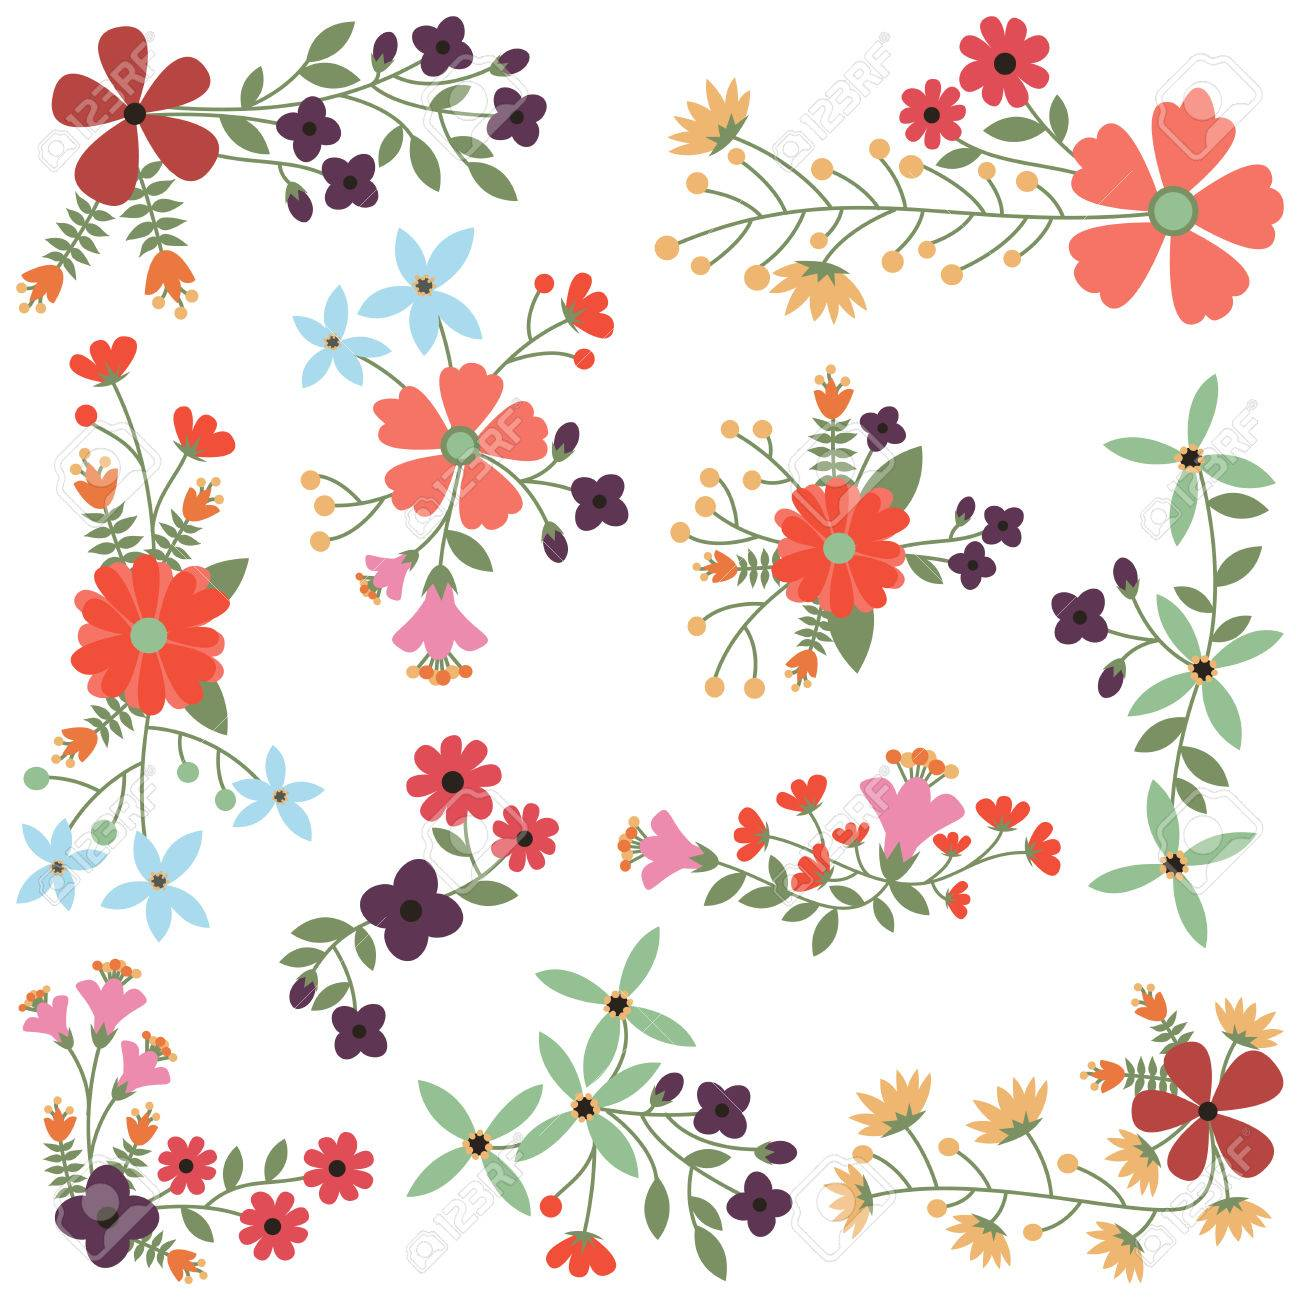 Vector Set of Vintage Style Flower Clusters - 29966409